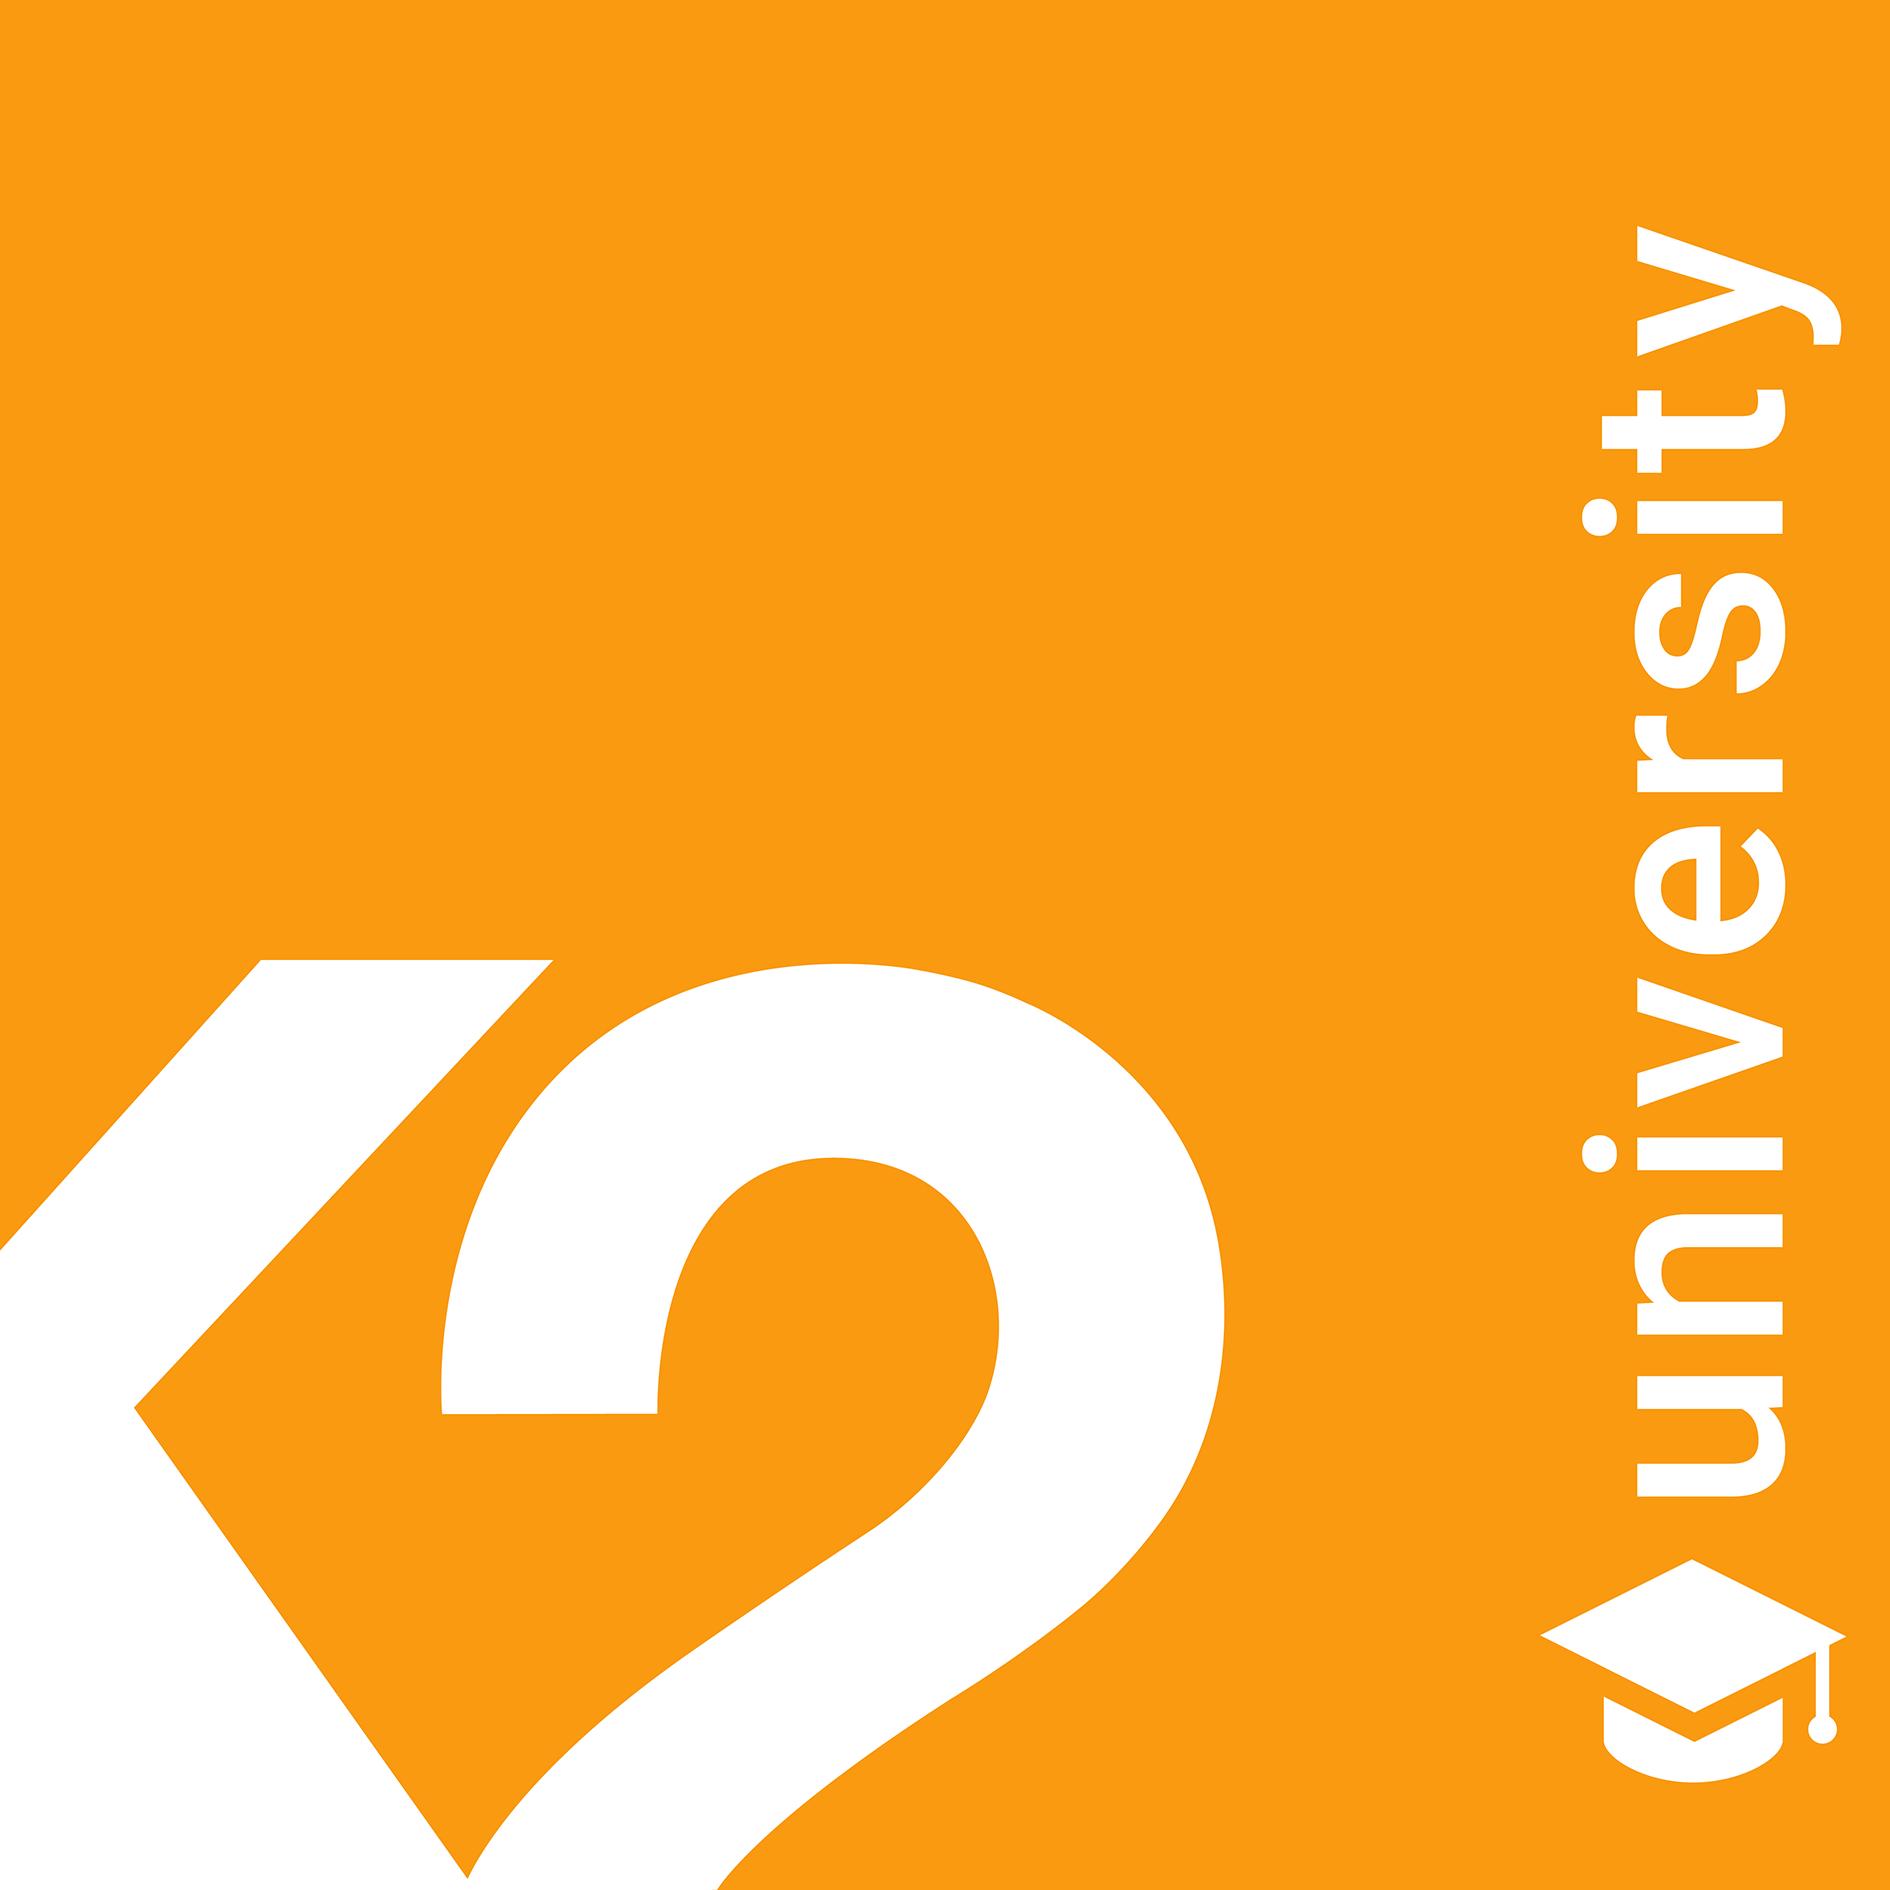 K2 University